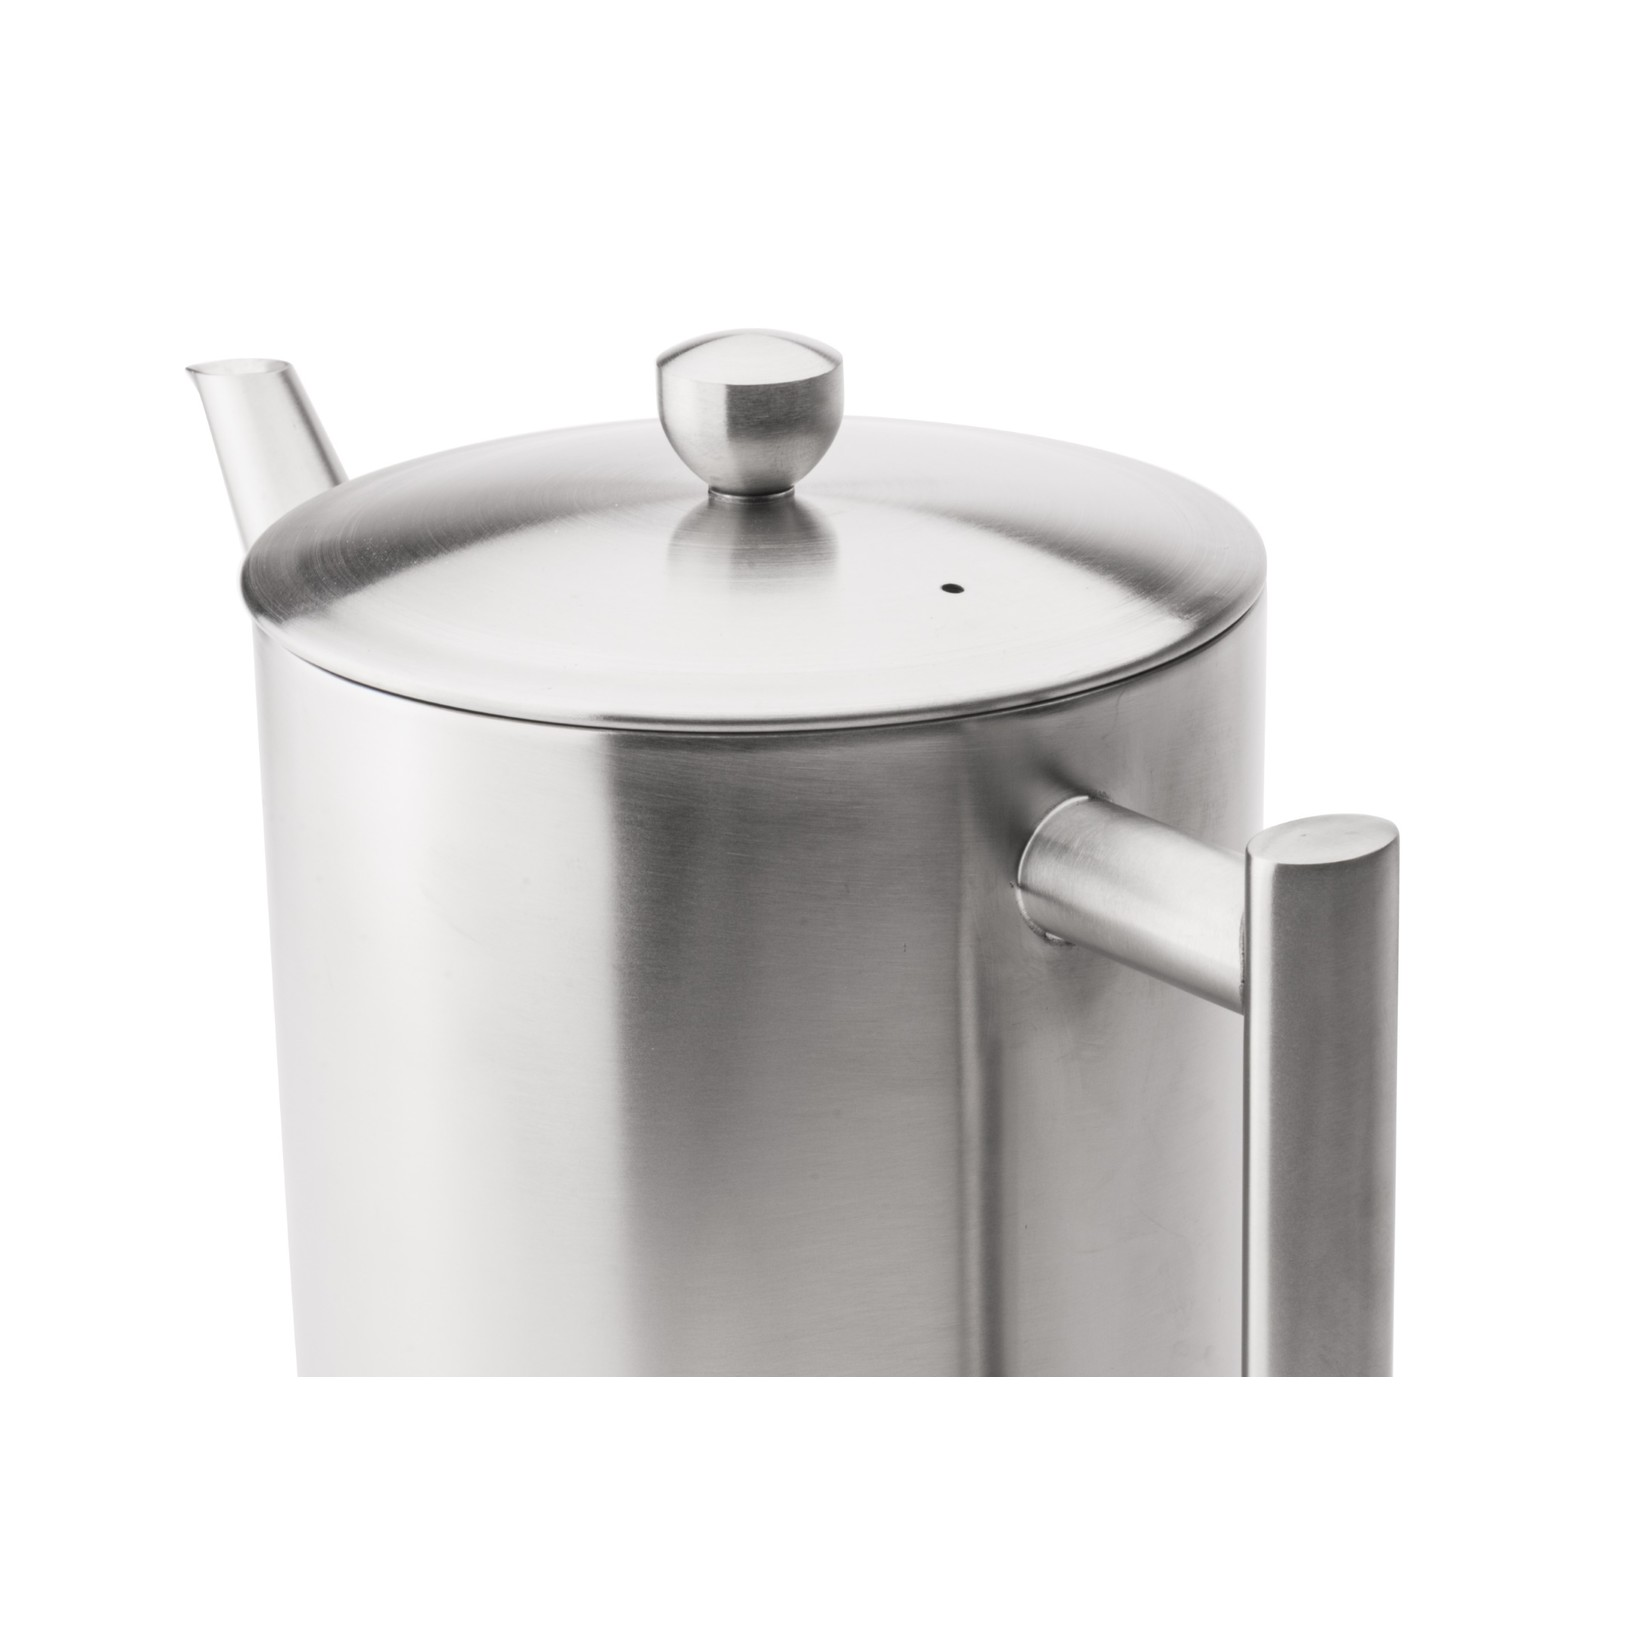 Bredemeijer Bredemeijer Minuet Cylindre Theepot mat metaal beslag 1,2 ltr